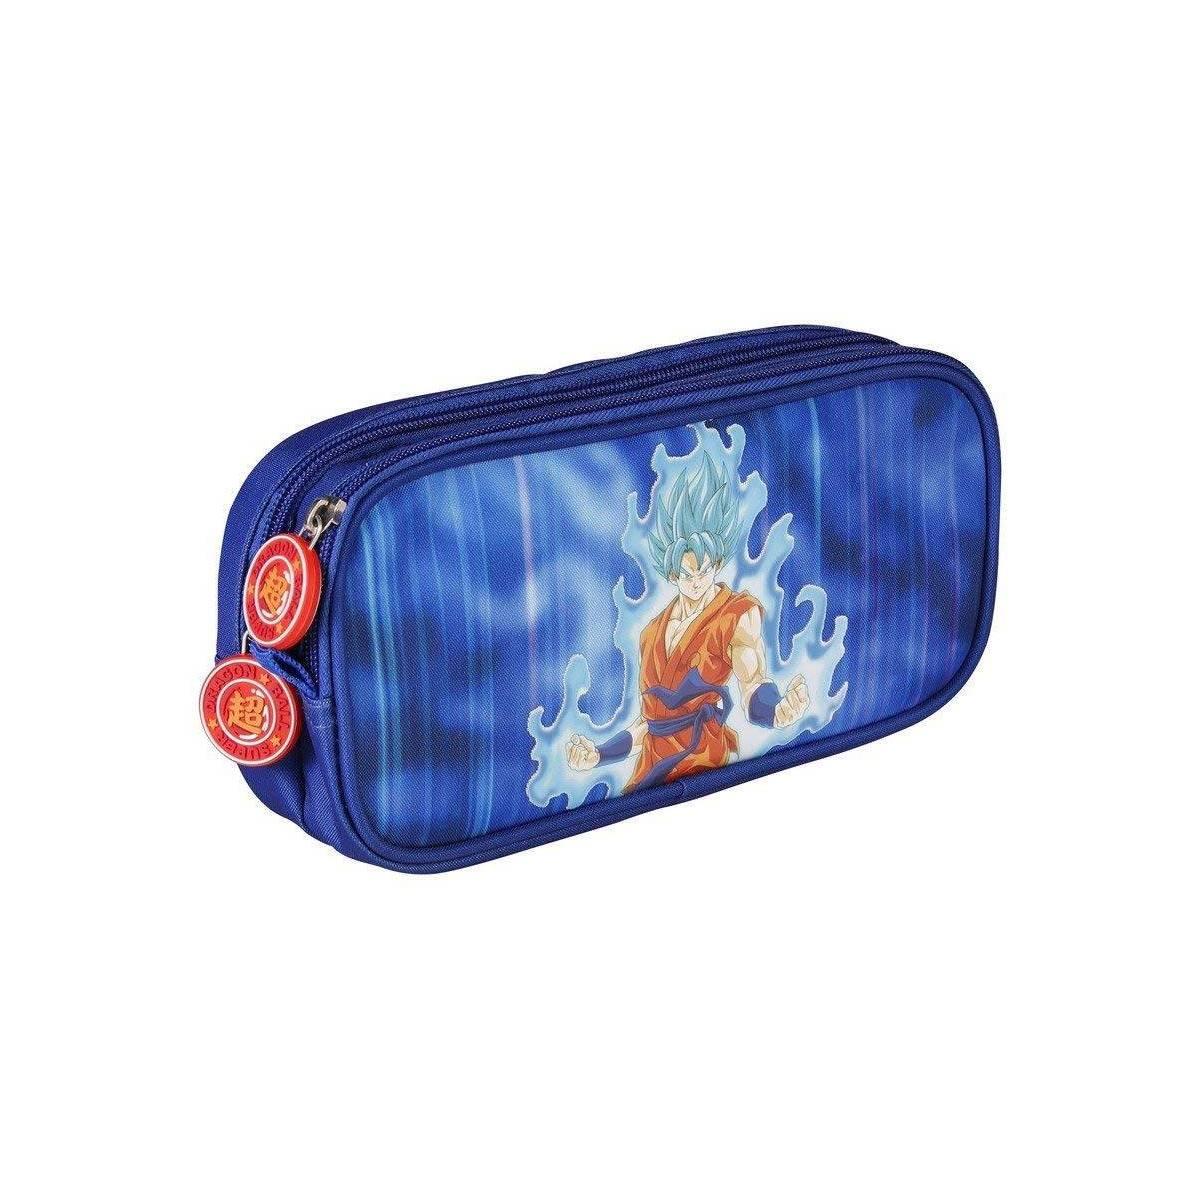 Dragon Ball - Trousse Rectangulaire 2 Compartiments Goku Bleu - 22 x 6 x 10 cm